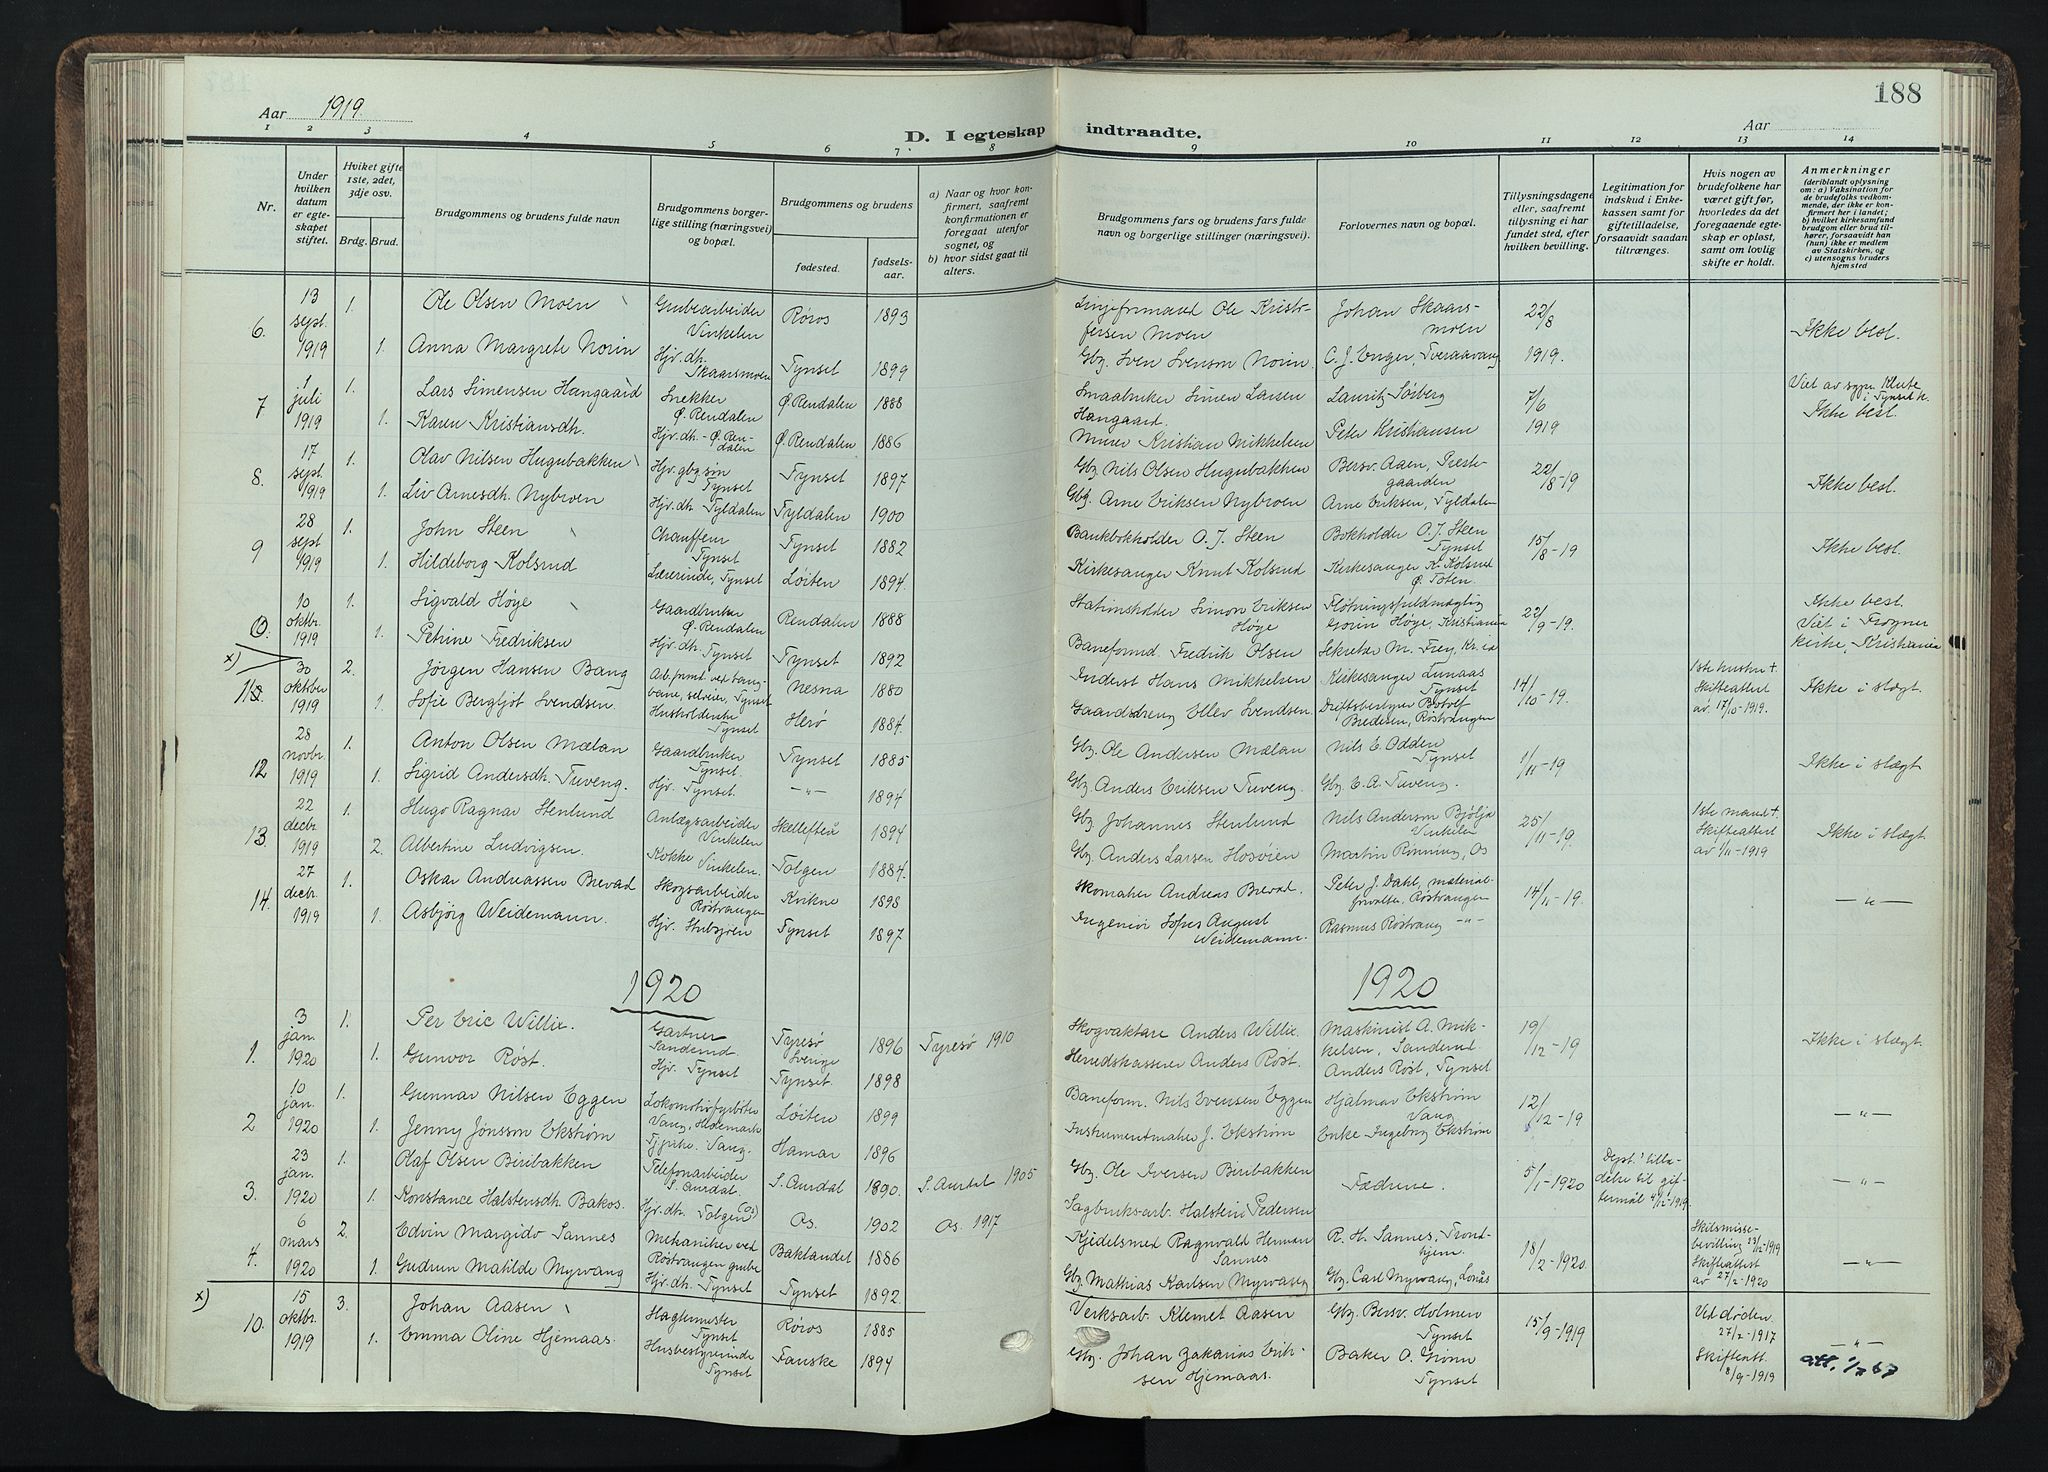 SAH, Tynset prestekontor, Ministerialbok nr. 26, 1915-1929, s. 188